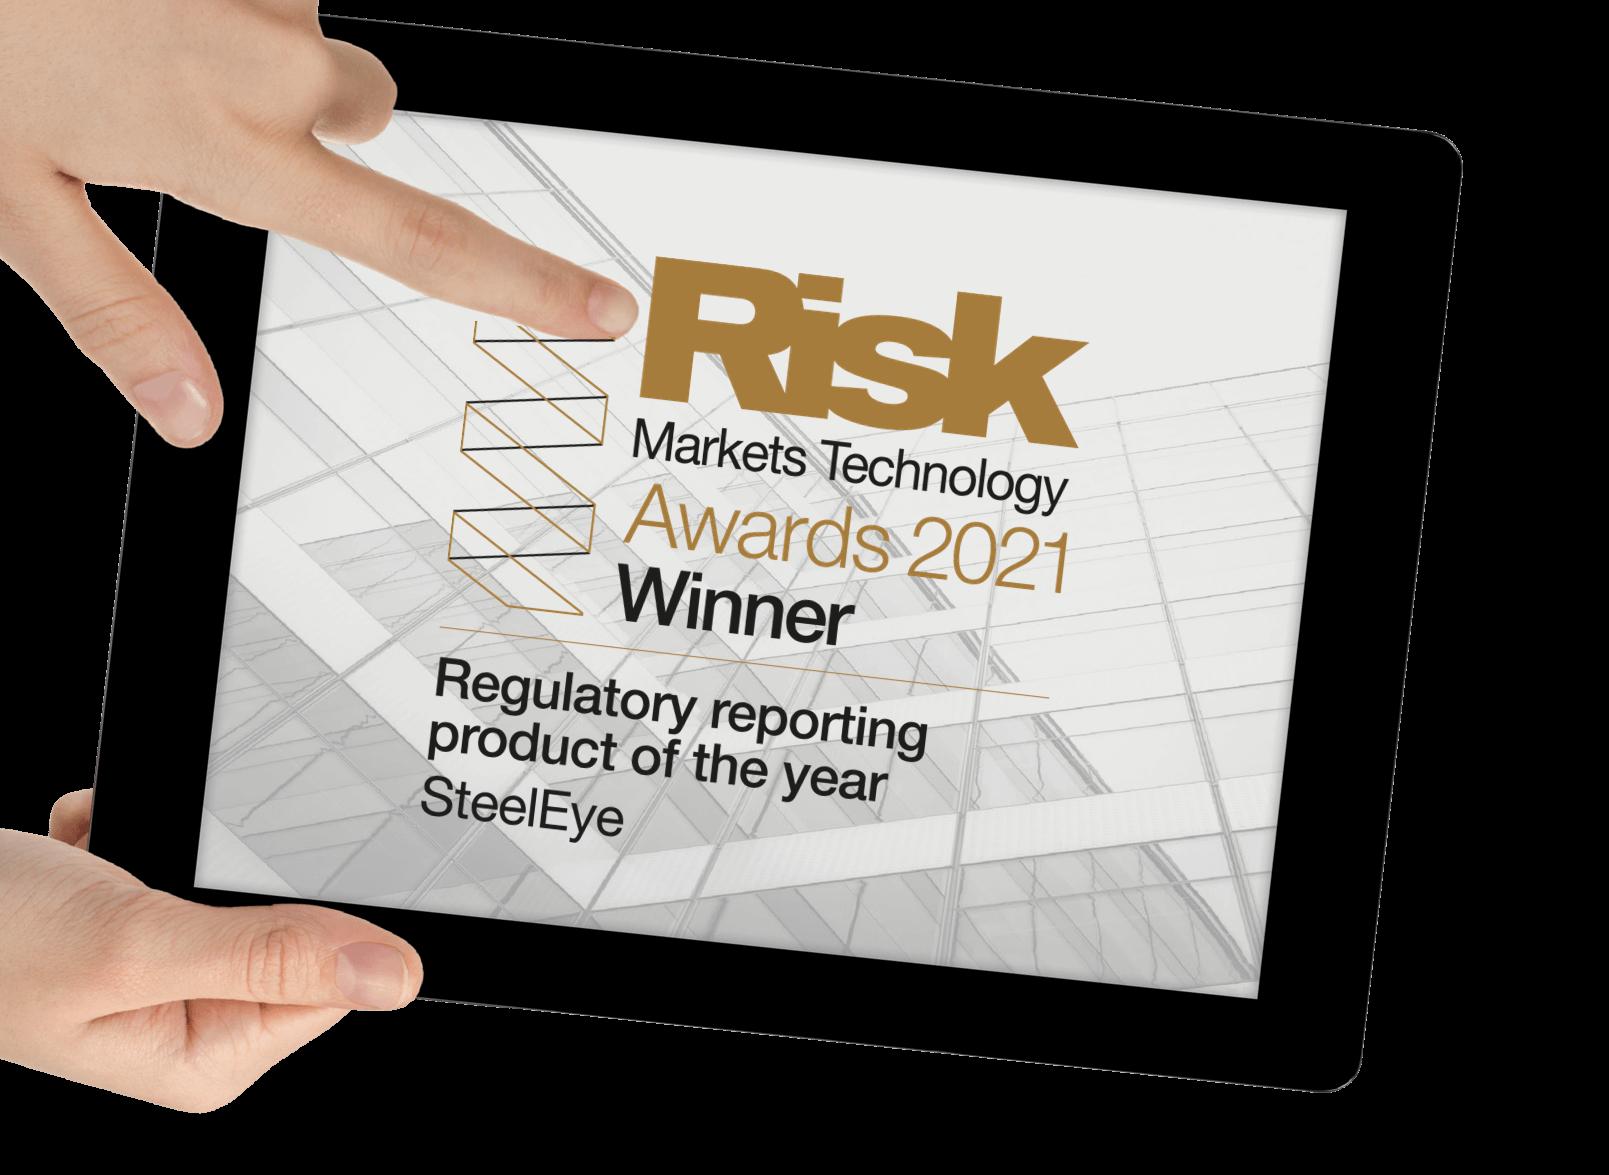 Risk Markets Technology Awards 2021 (1)